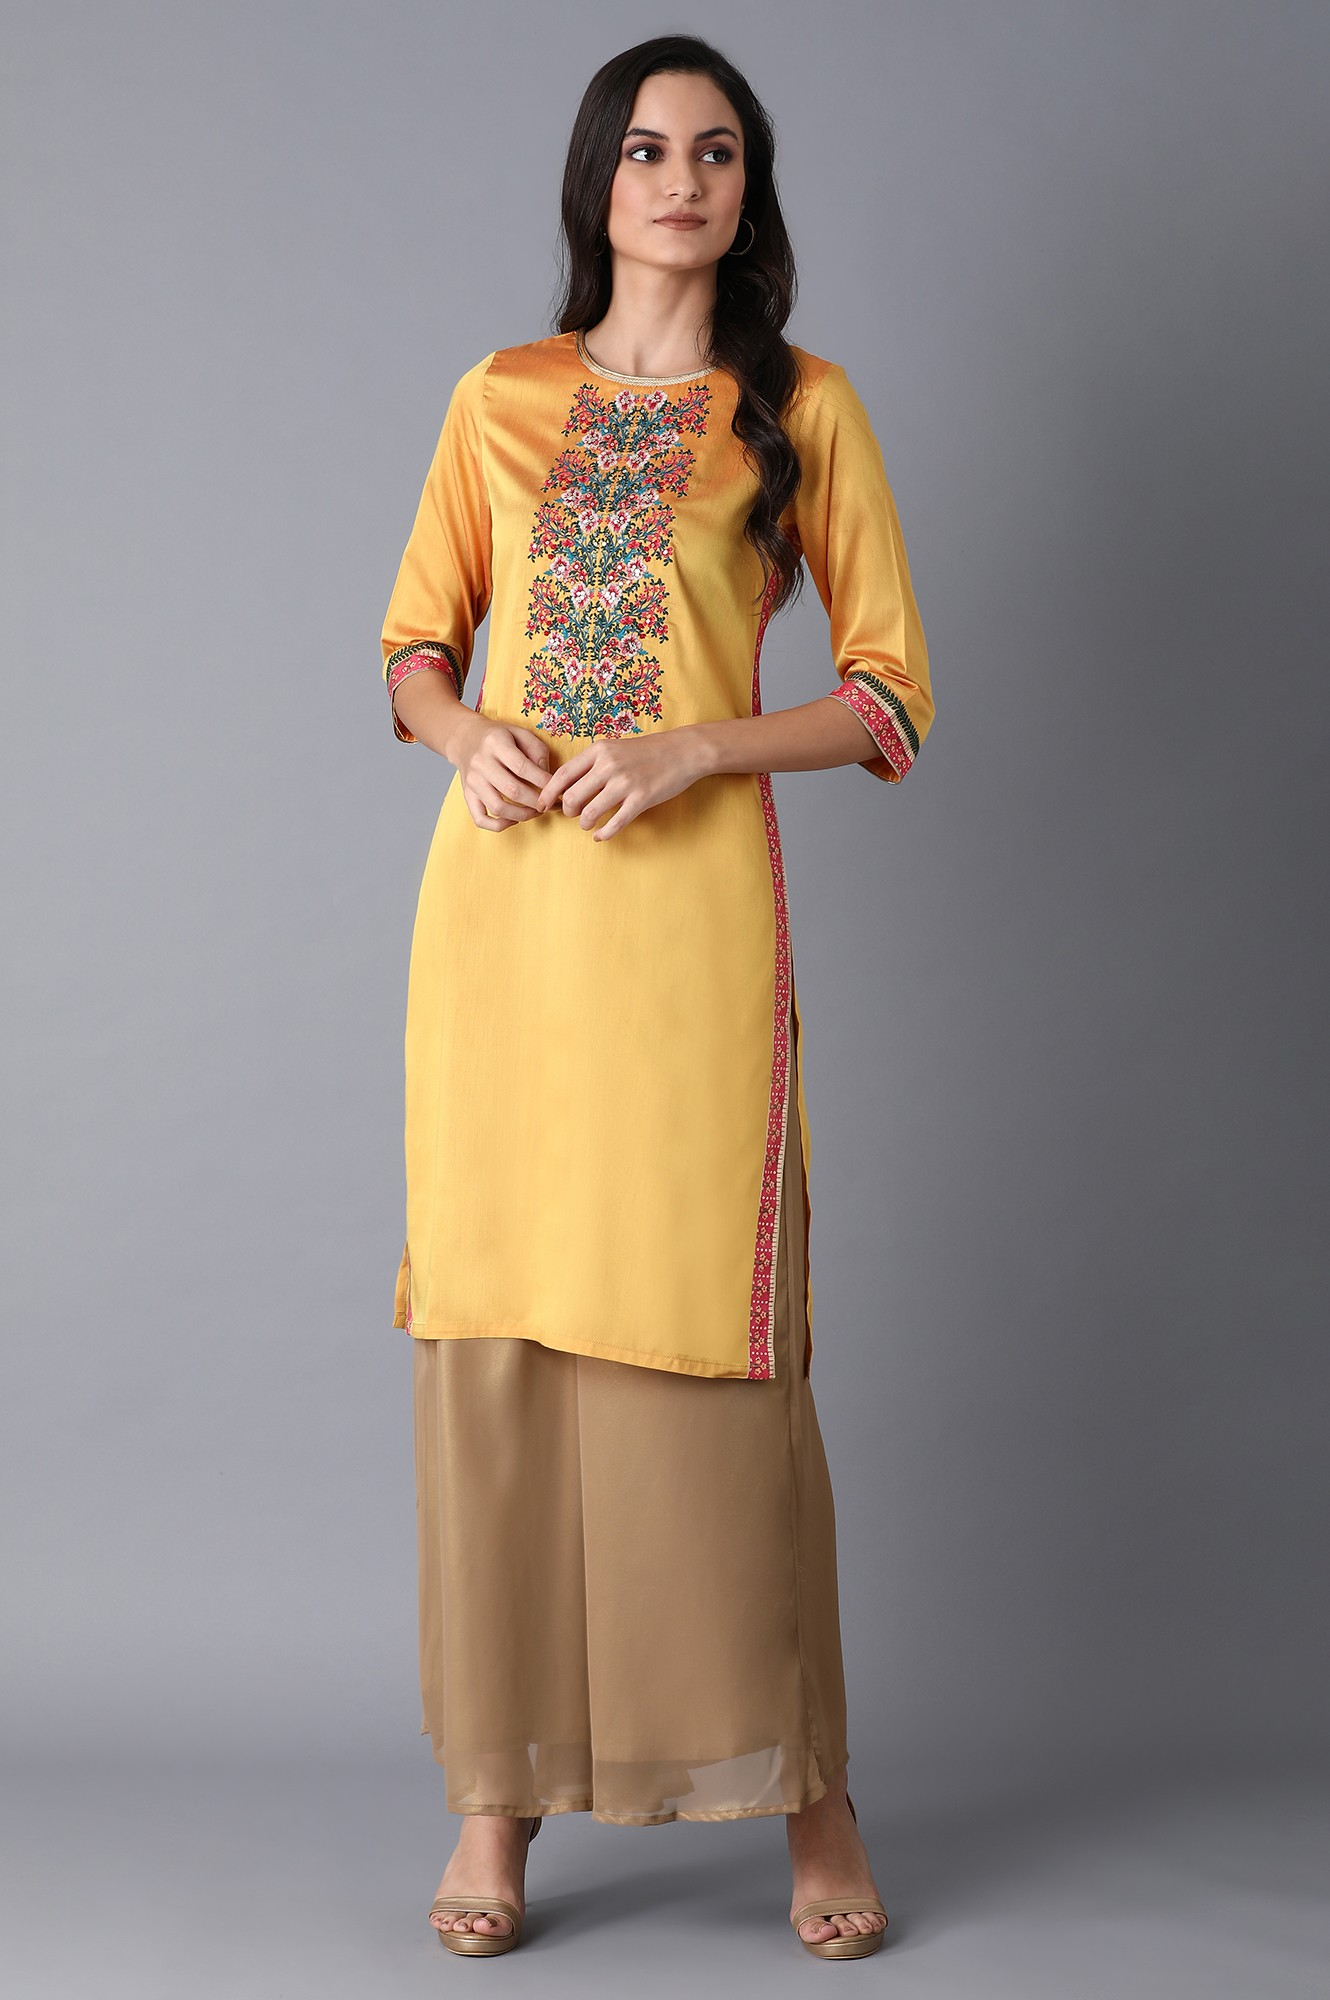 W   Wishful by W Yellow Multicolored Embroidered Kurta